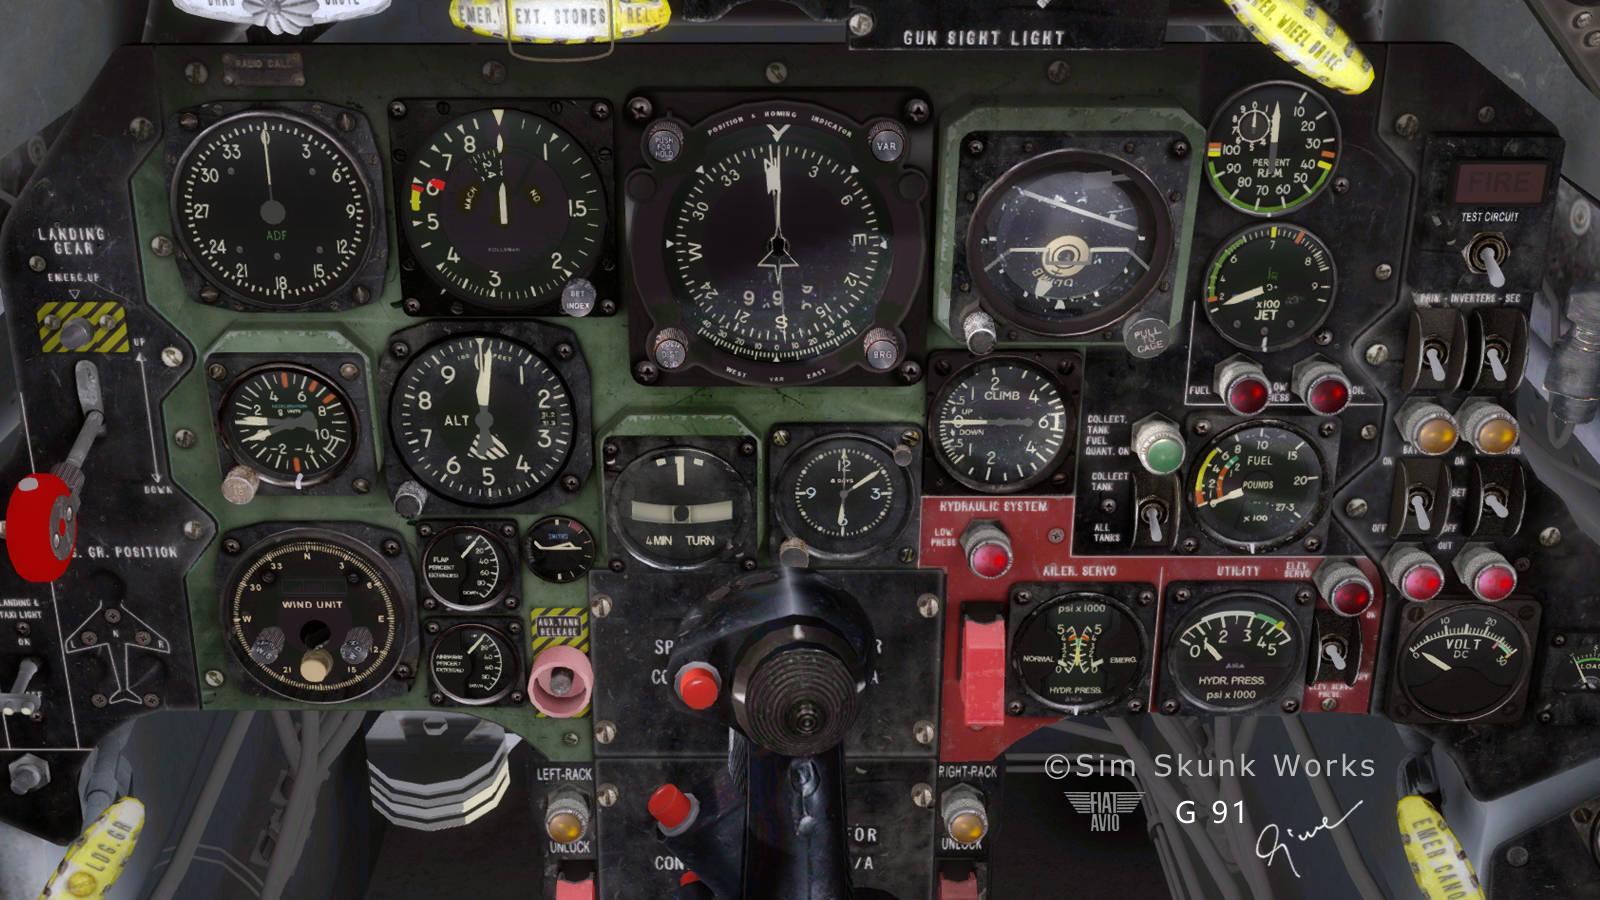 Just Flight - Sim Skunk Works Fiat G.91 (for FSX)